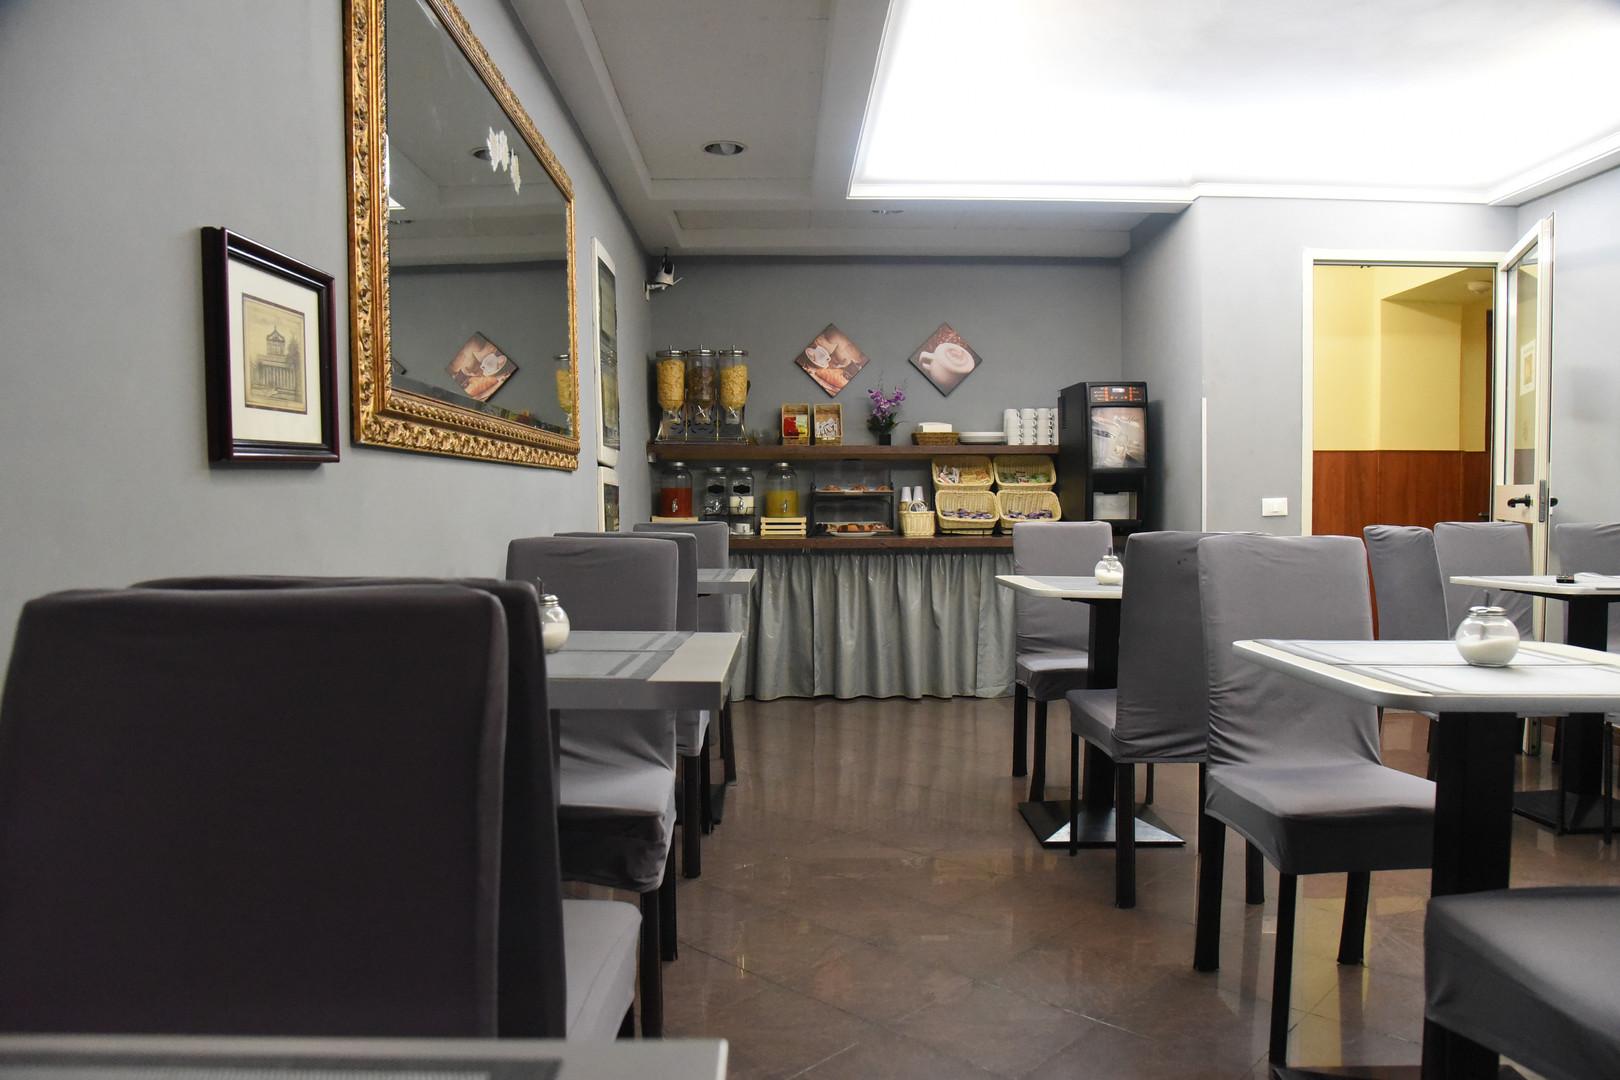 Hotel_Sallustio_2.jpg